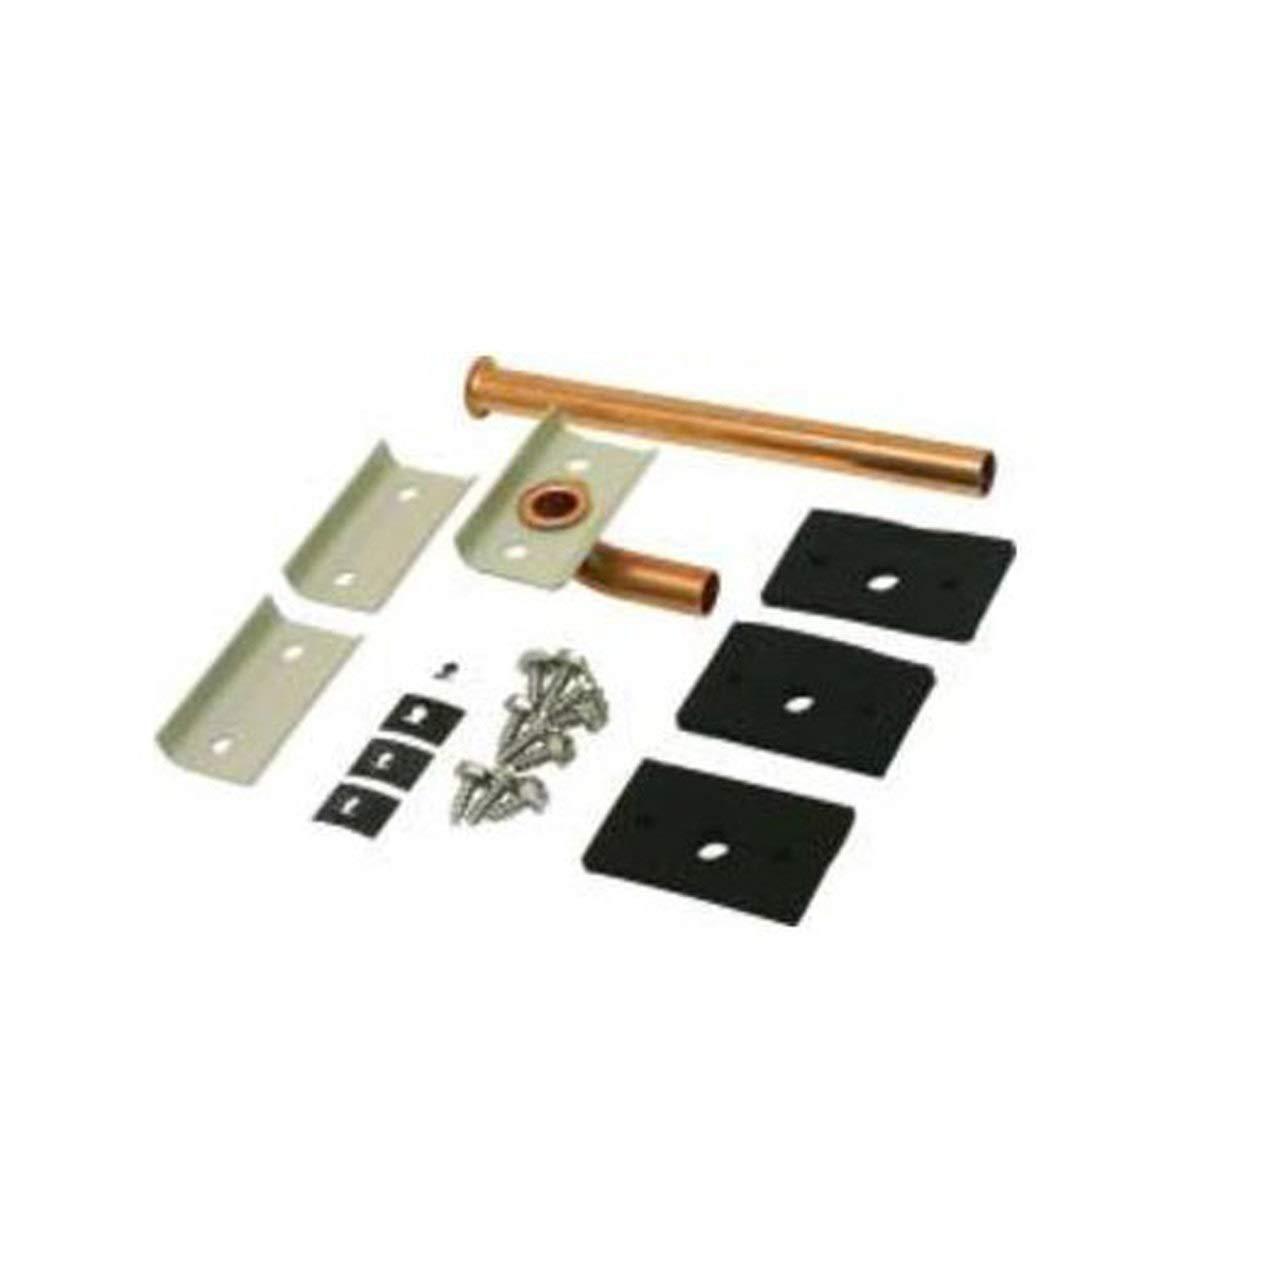 GE Zoneline Internal/External Drain Kit - All Series RAD10